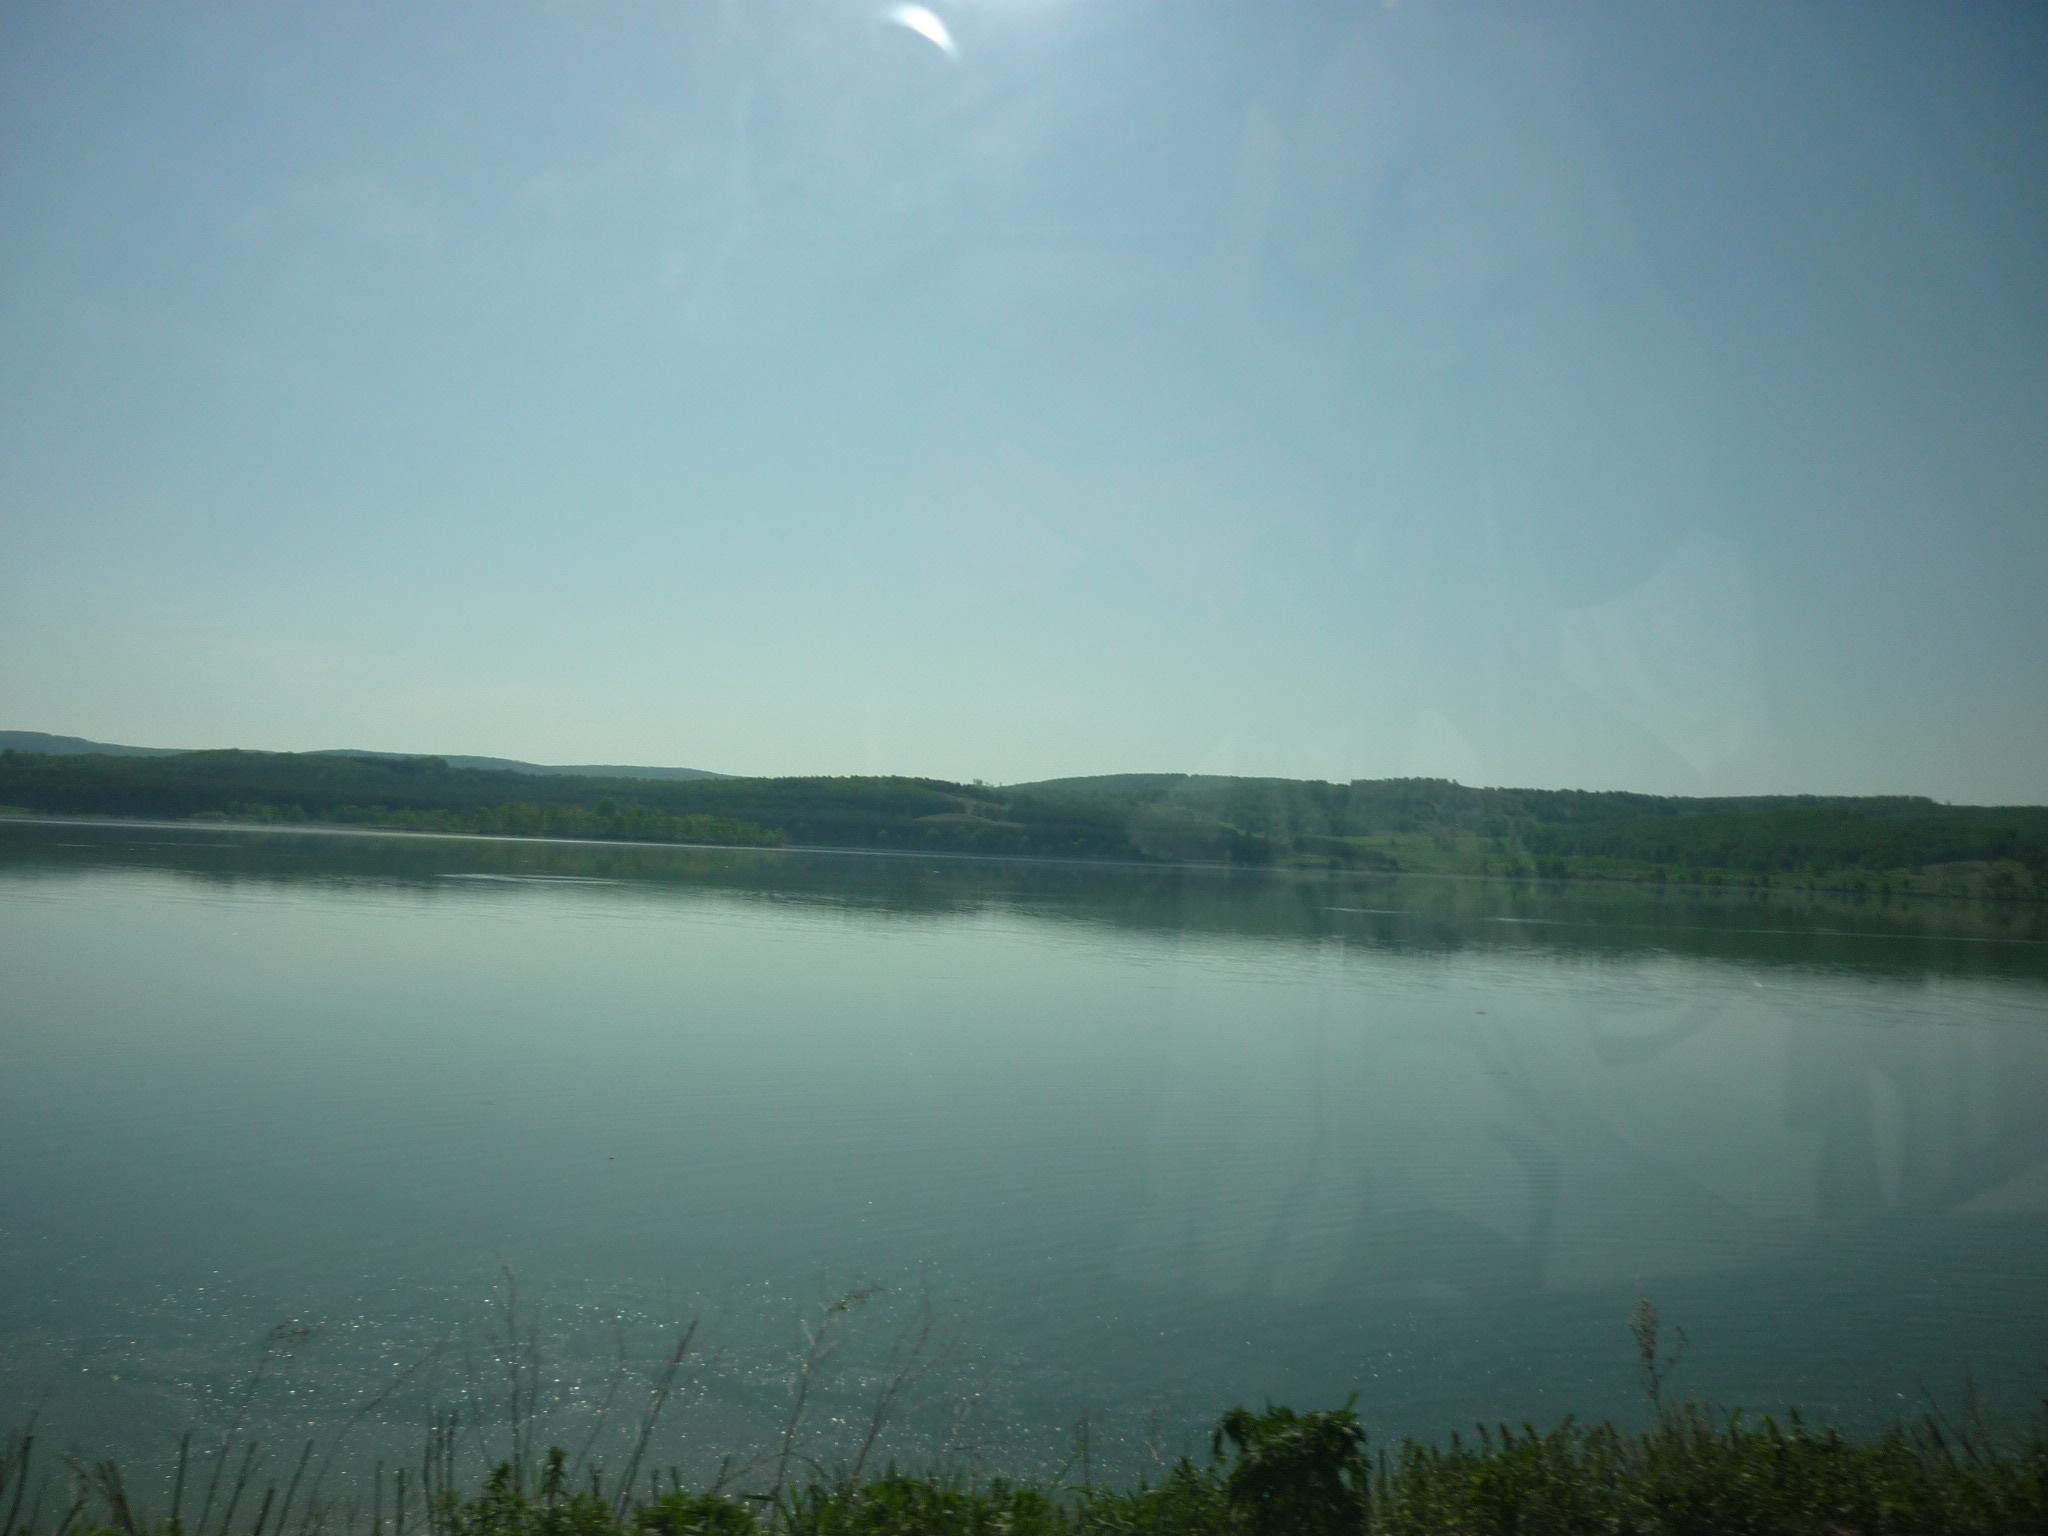 Вид на озеро Аушкуль из машины (03.07.2015)